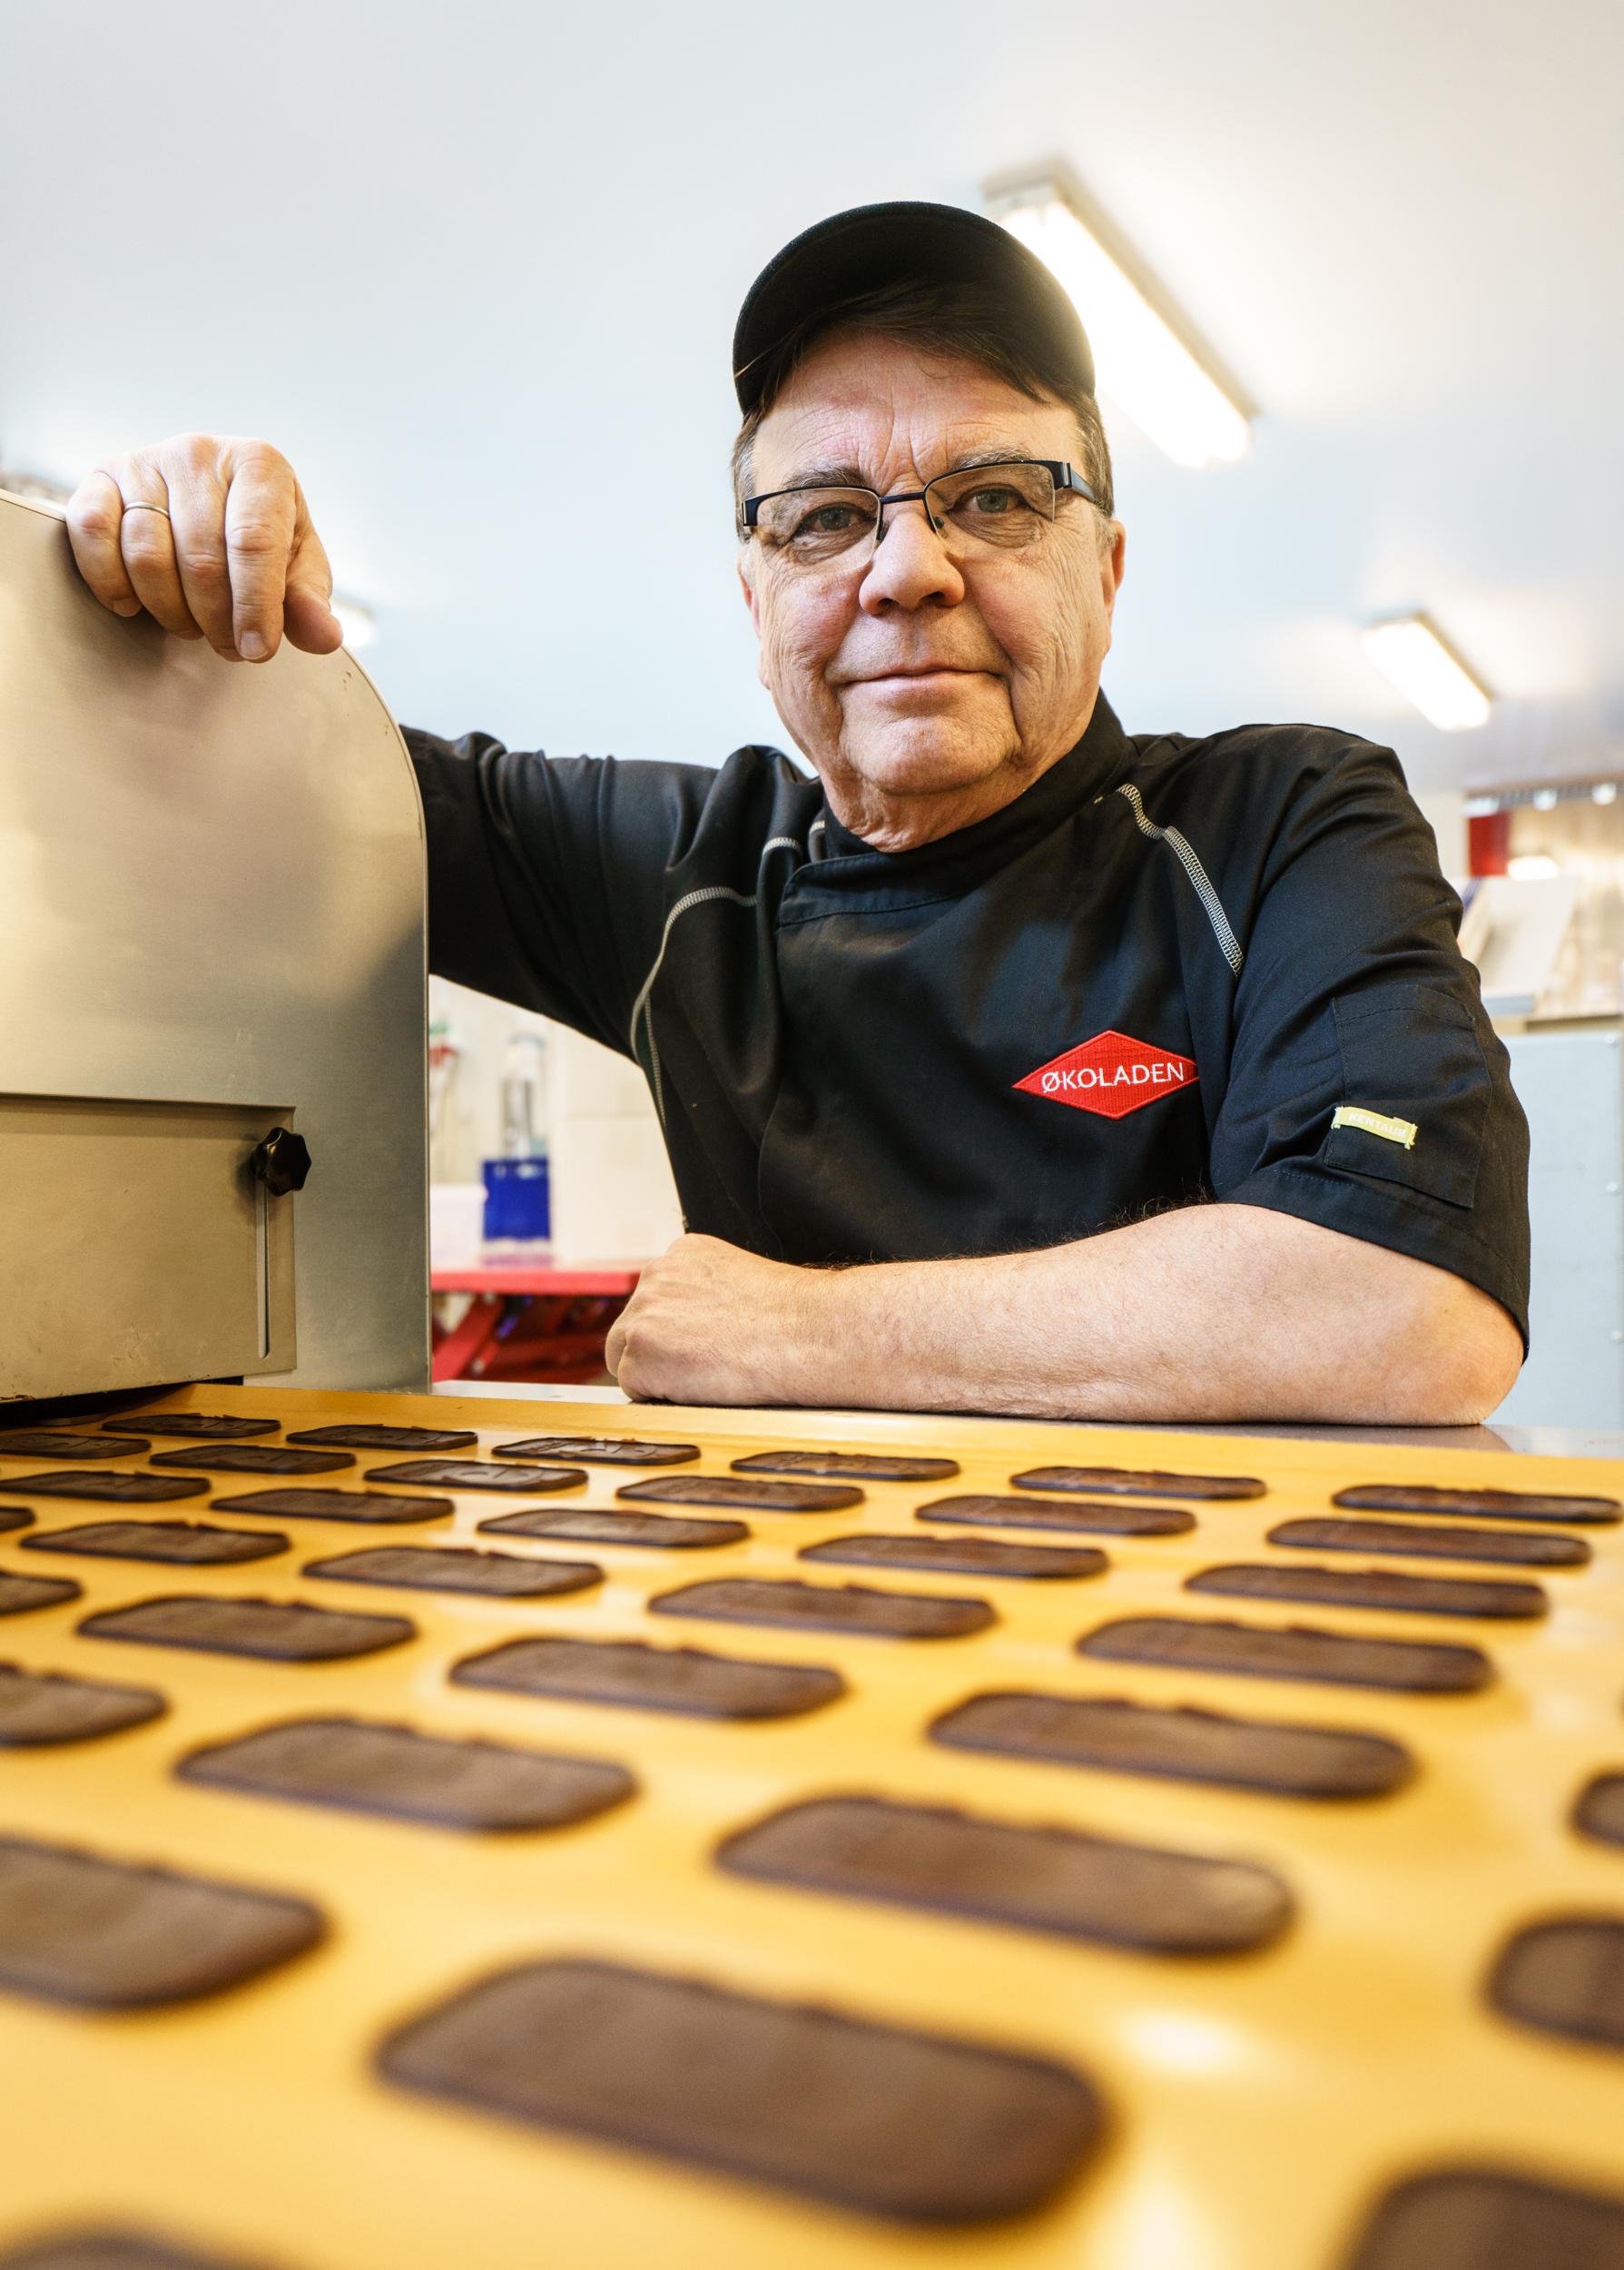 Jan Elmelund laver håndlavet dansk chokolade